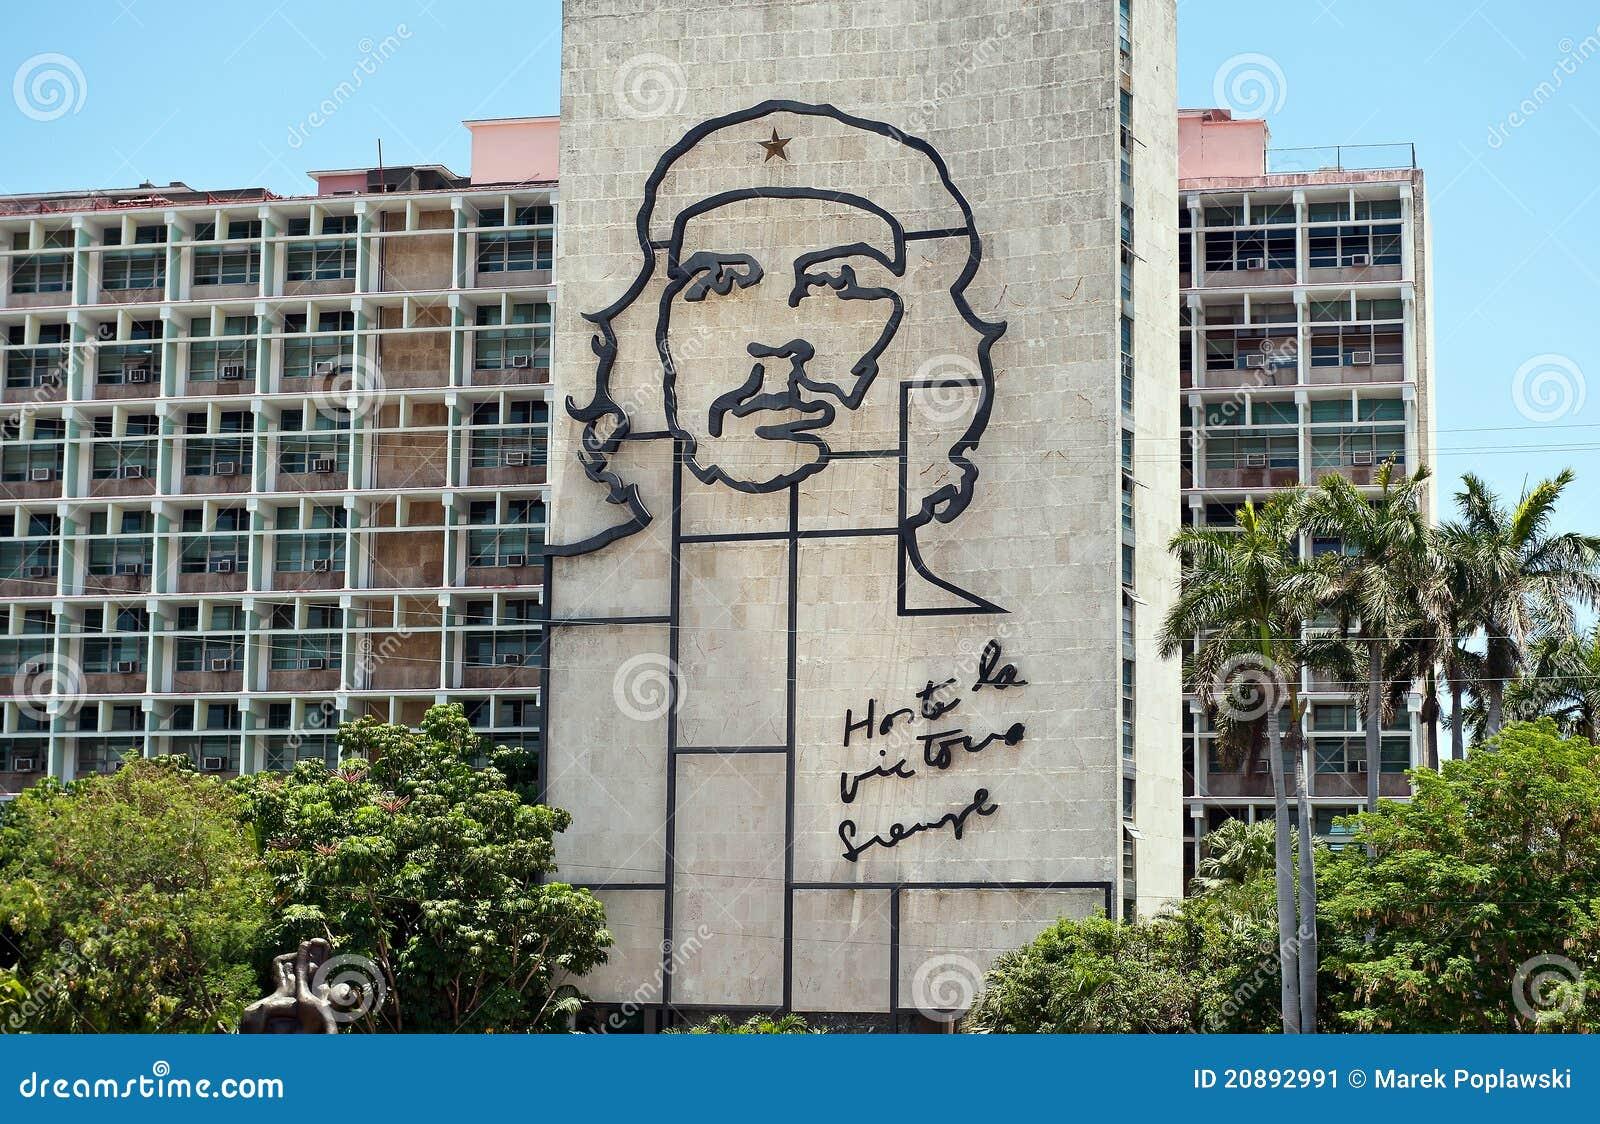 Iron work of Che Guevara image in Havana Cuba